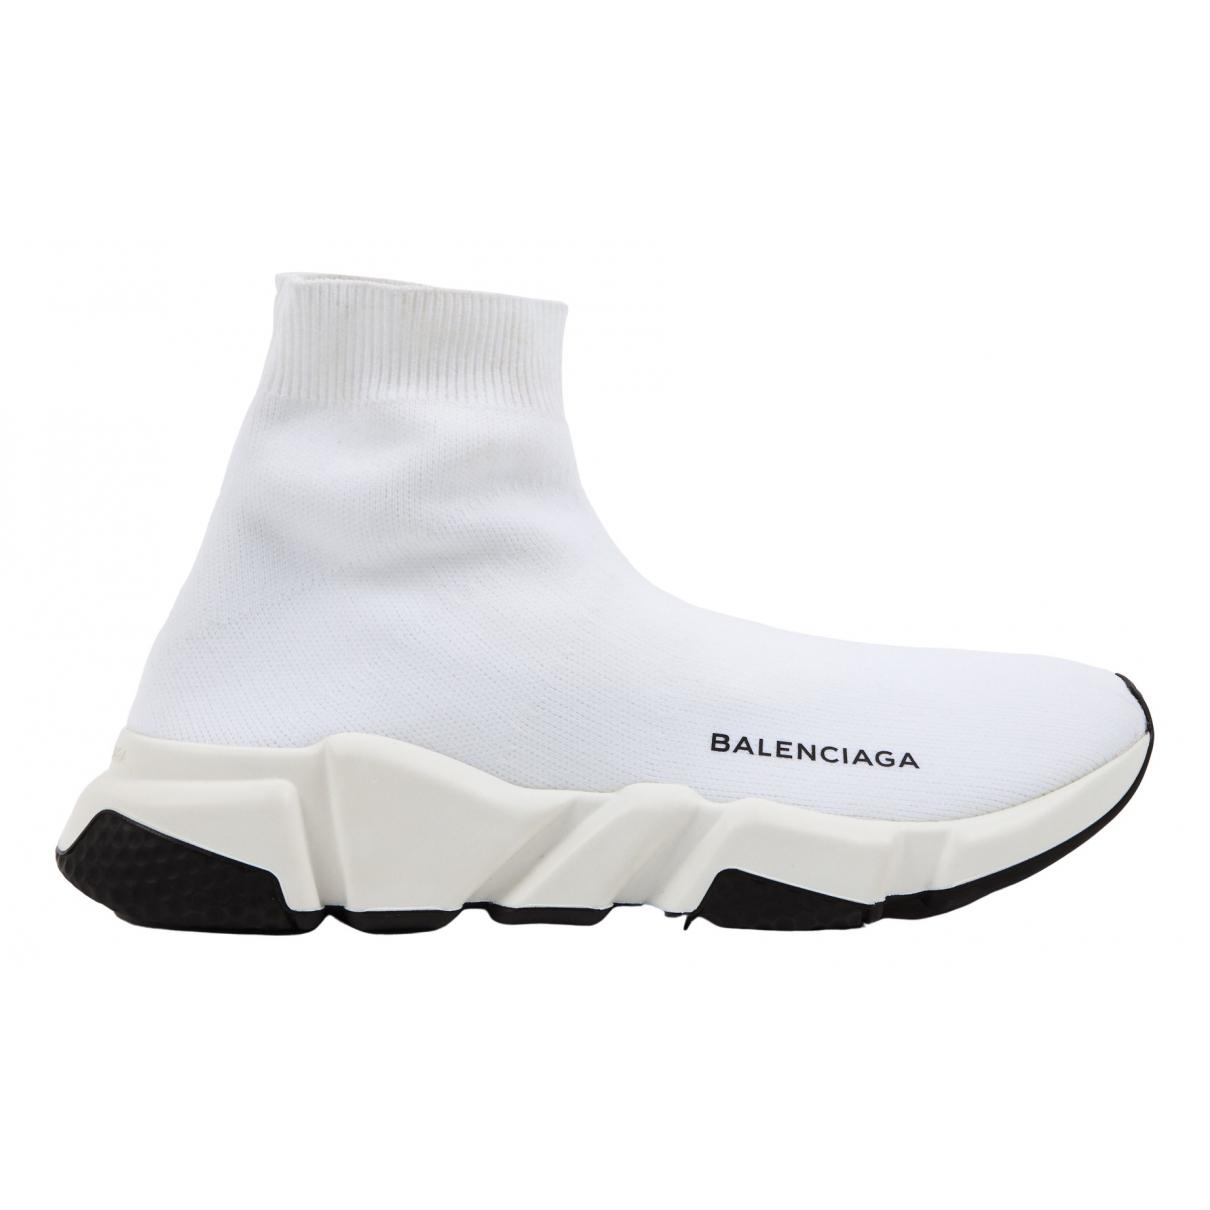 Balenciaga - Baskets Speed pour femme en toile - jaune